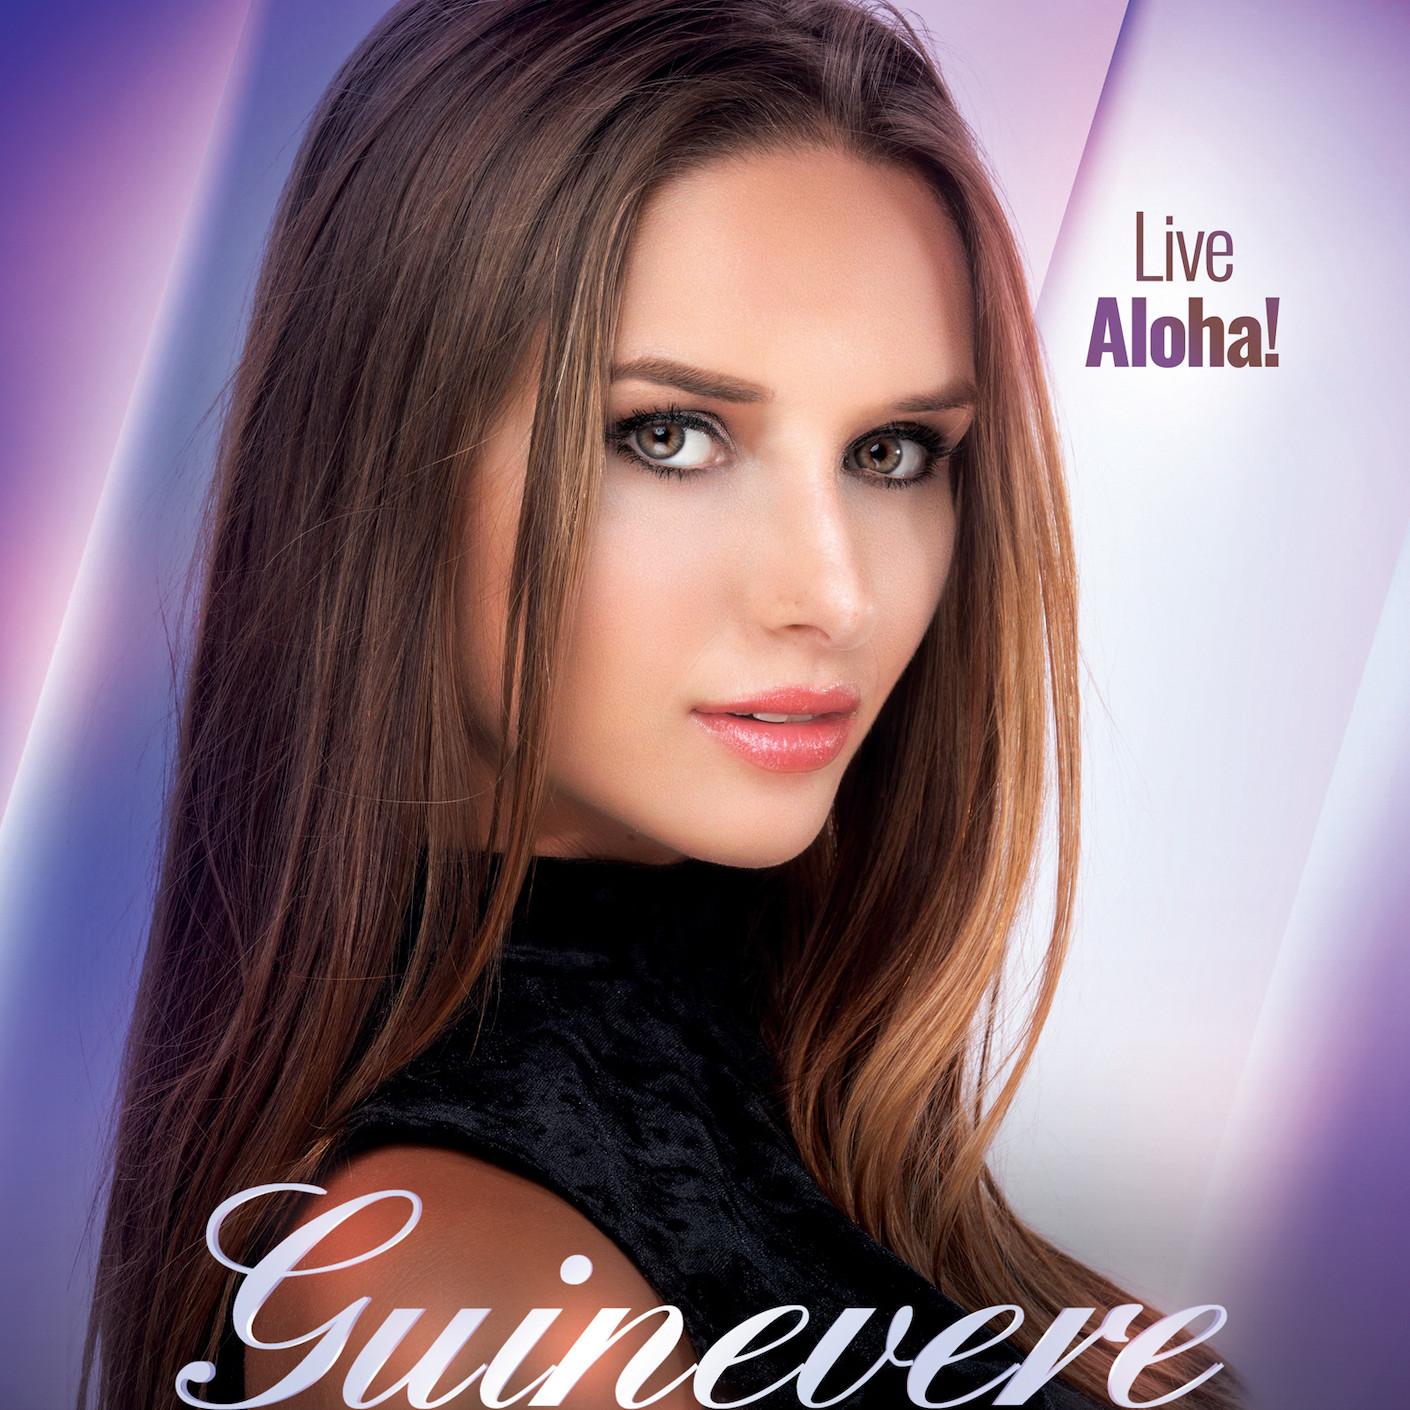 Guinevere Davenport